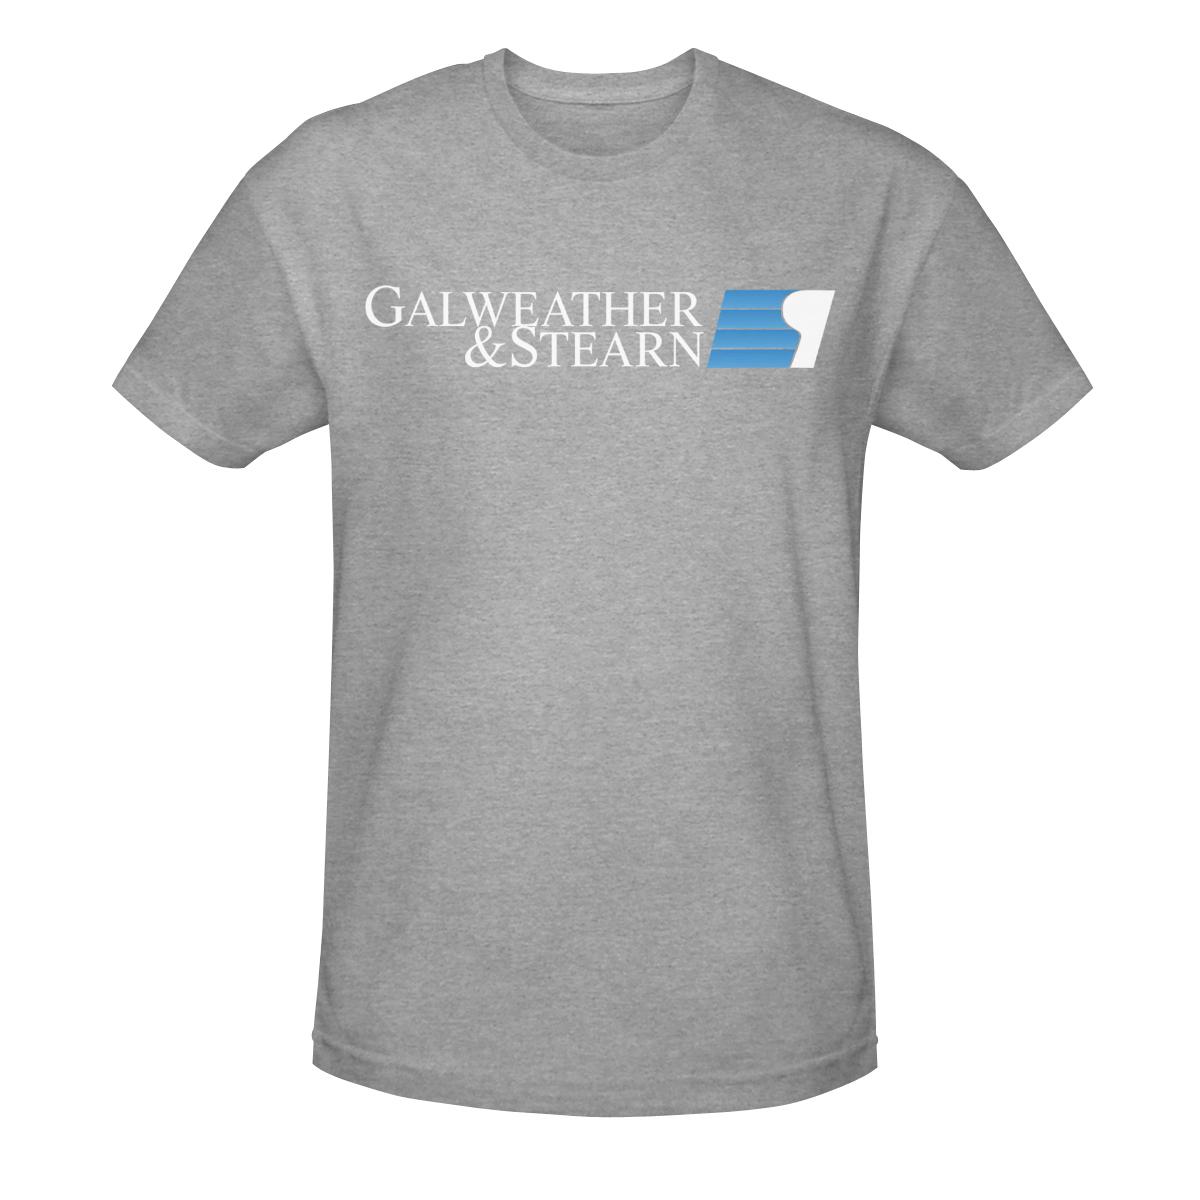 House Of Lies Galweather & Stearn Logo T-Shirt [Grey]